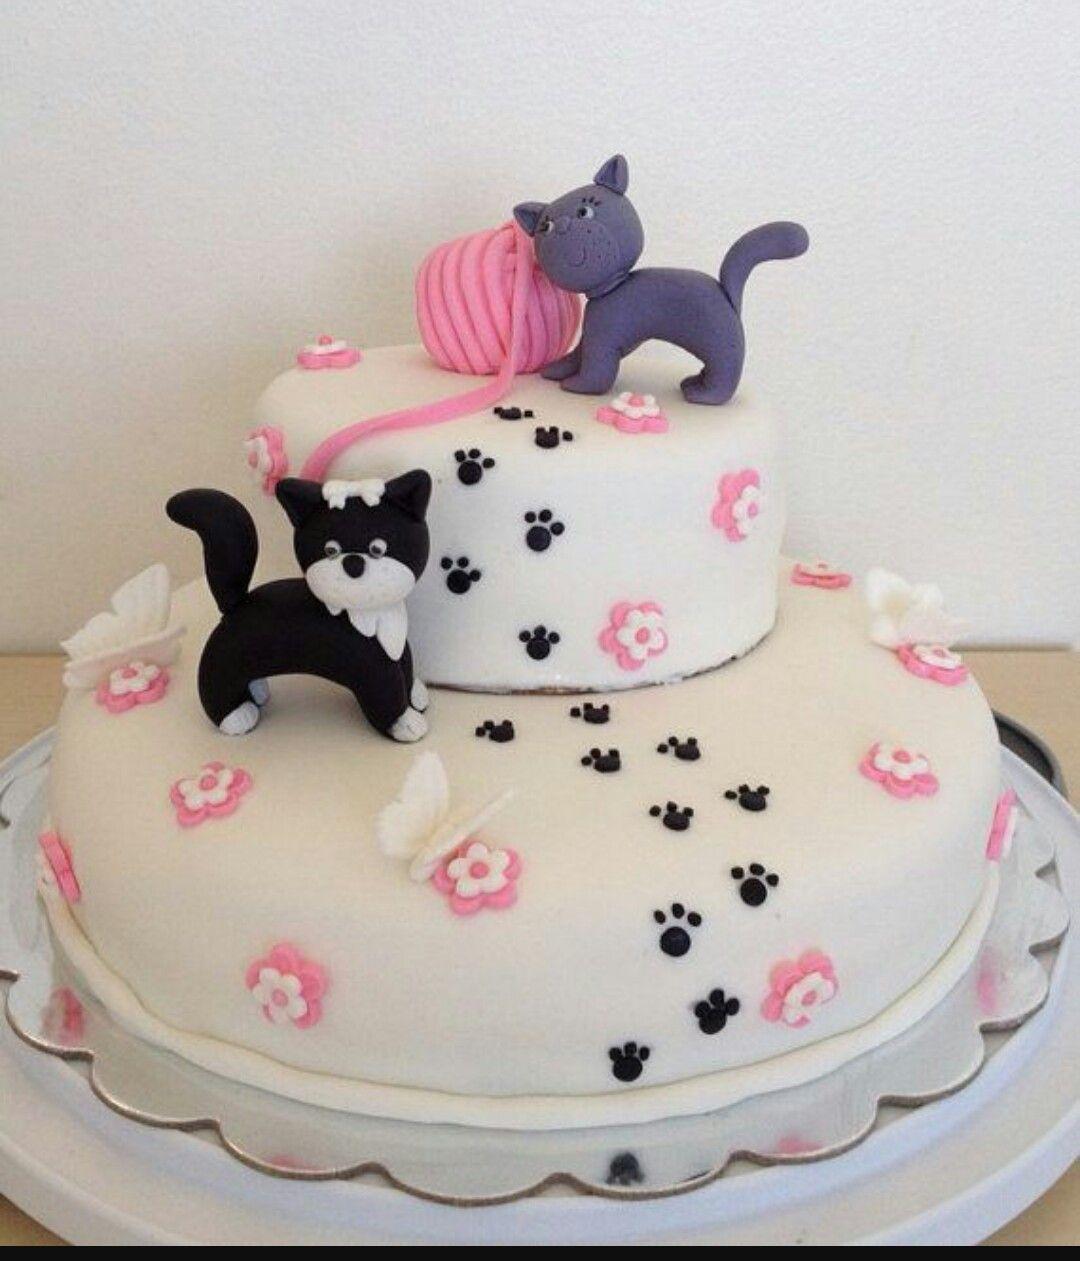 Pin by Cindi Switzer on Birthday Birthday cake for cat